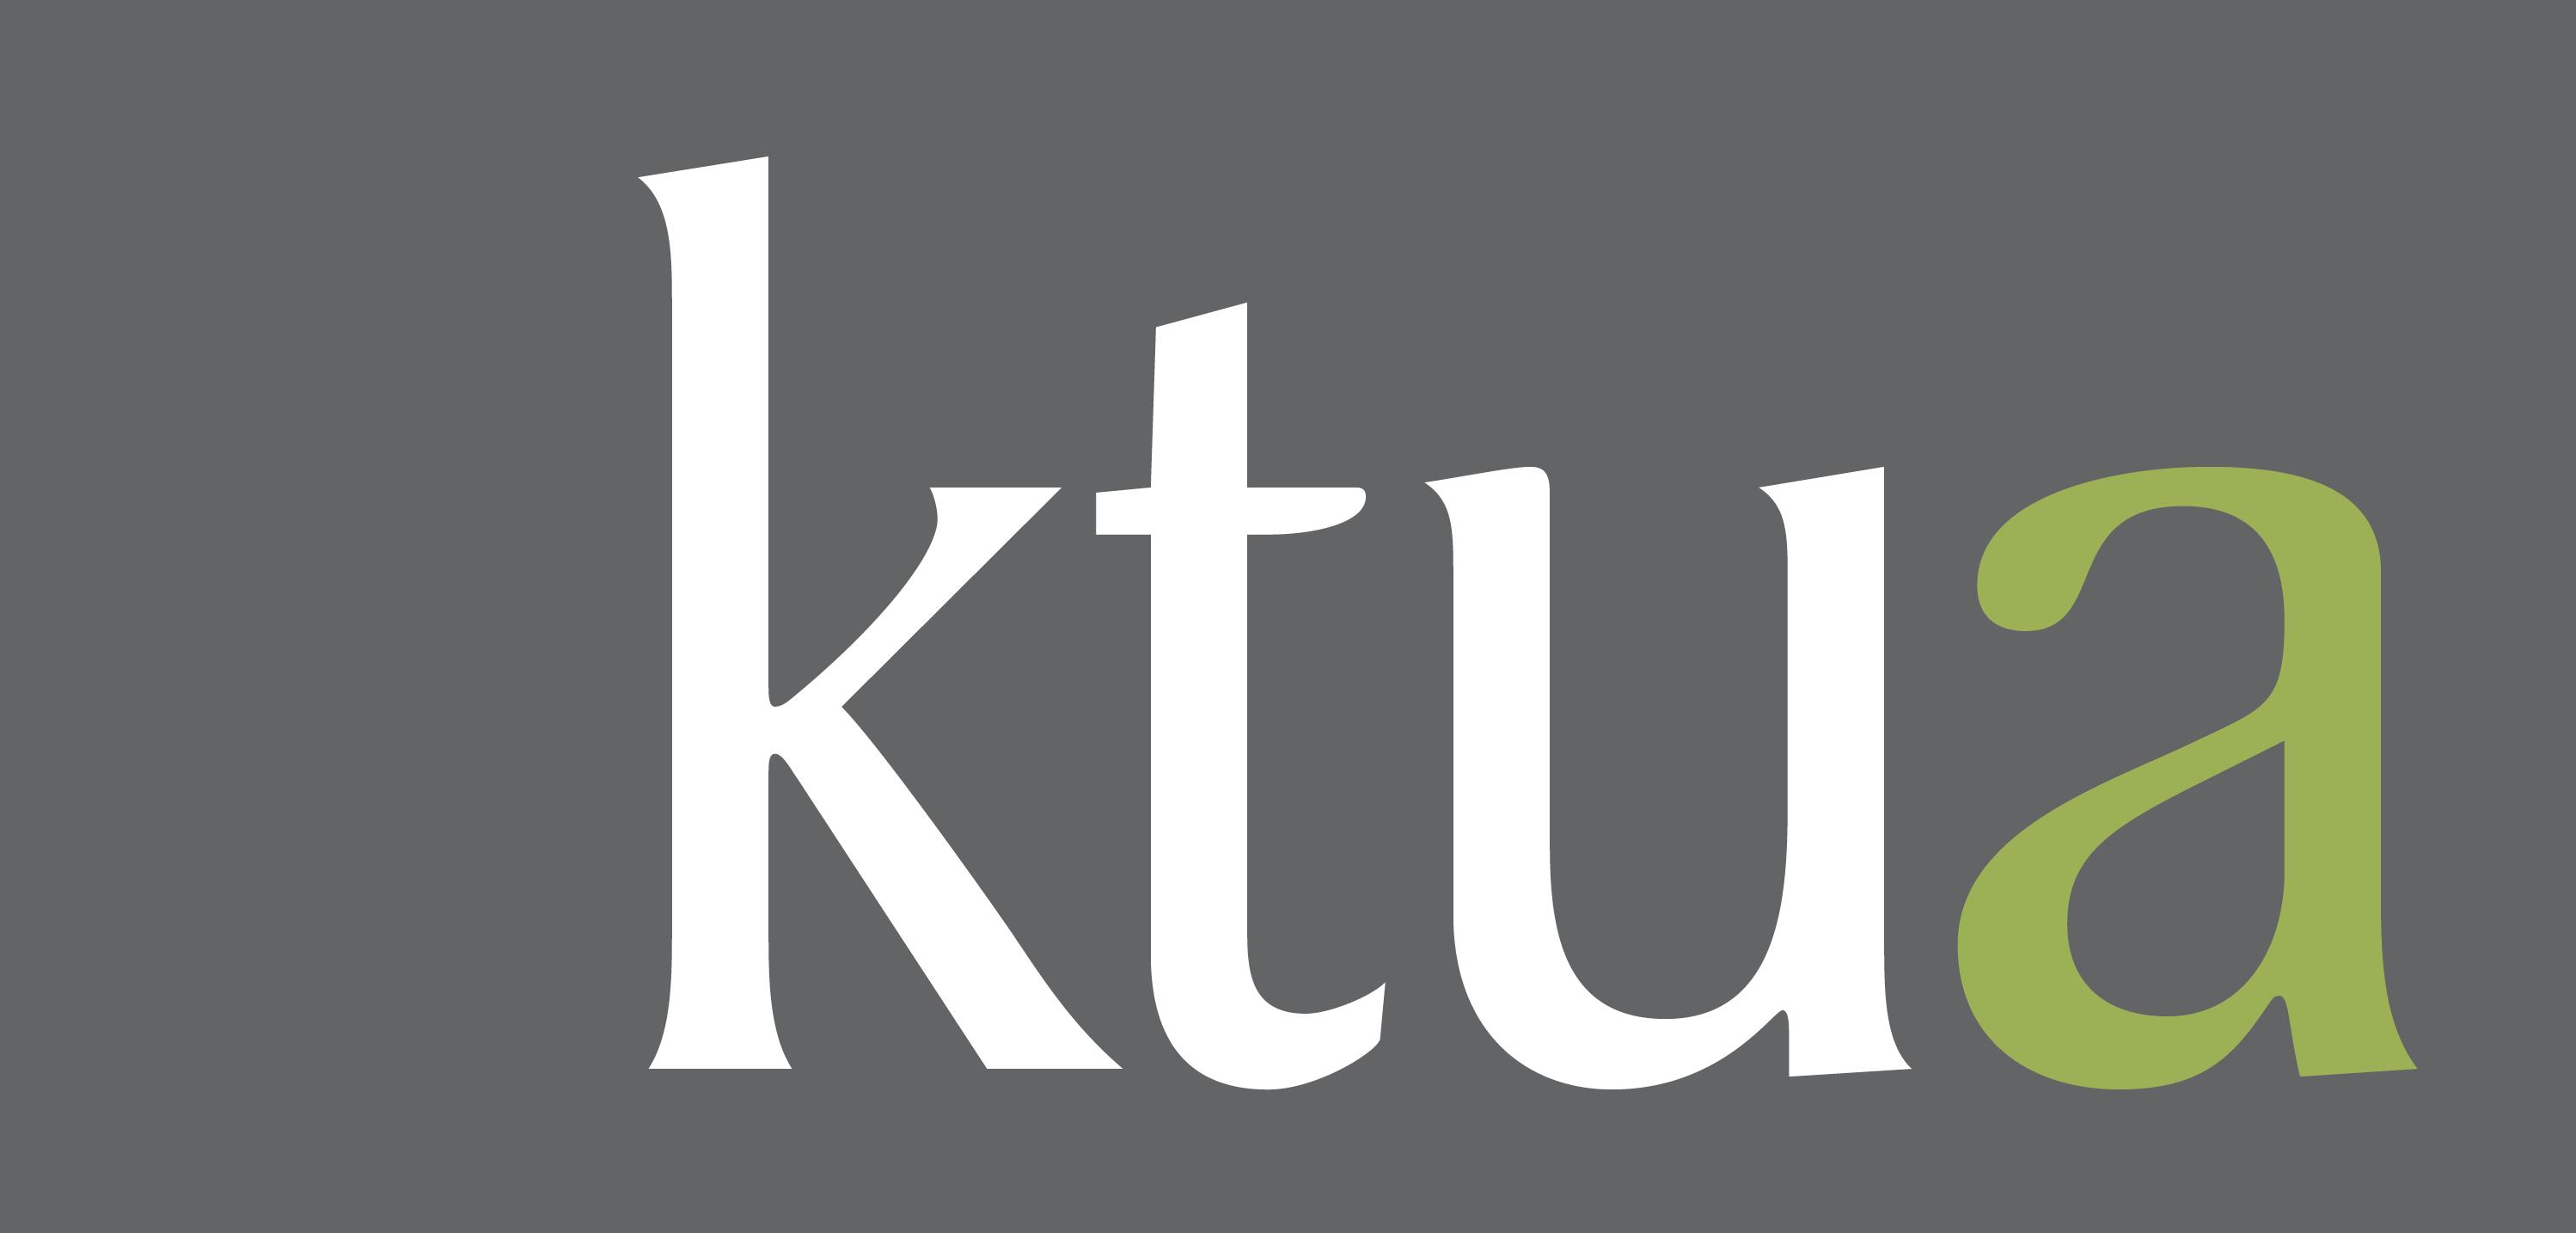 2017_KTUA_Color_Logo_2.png